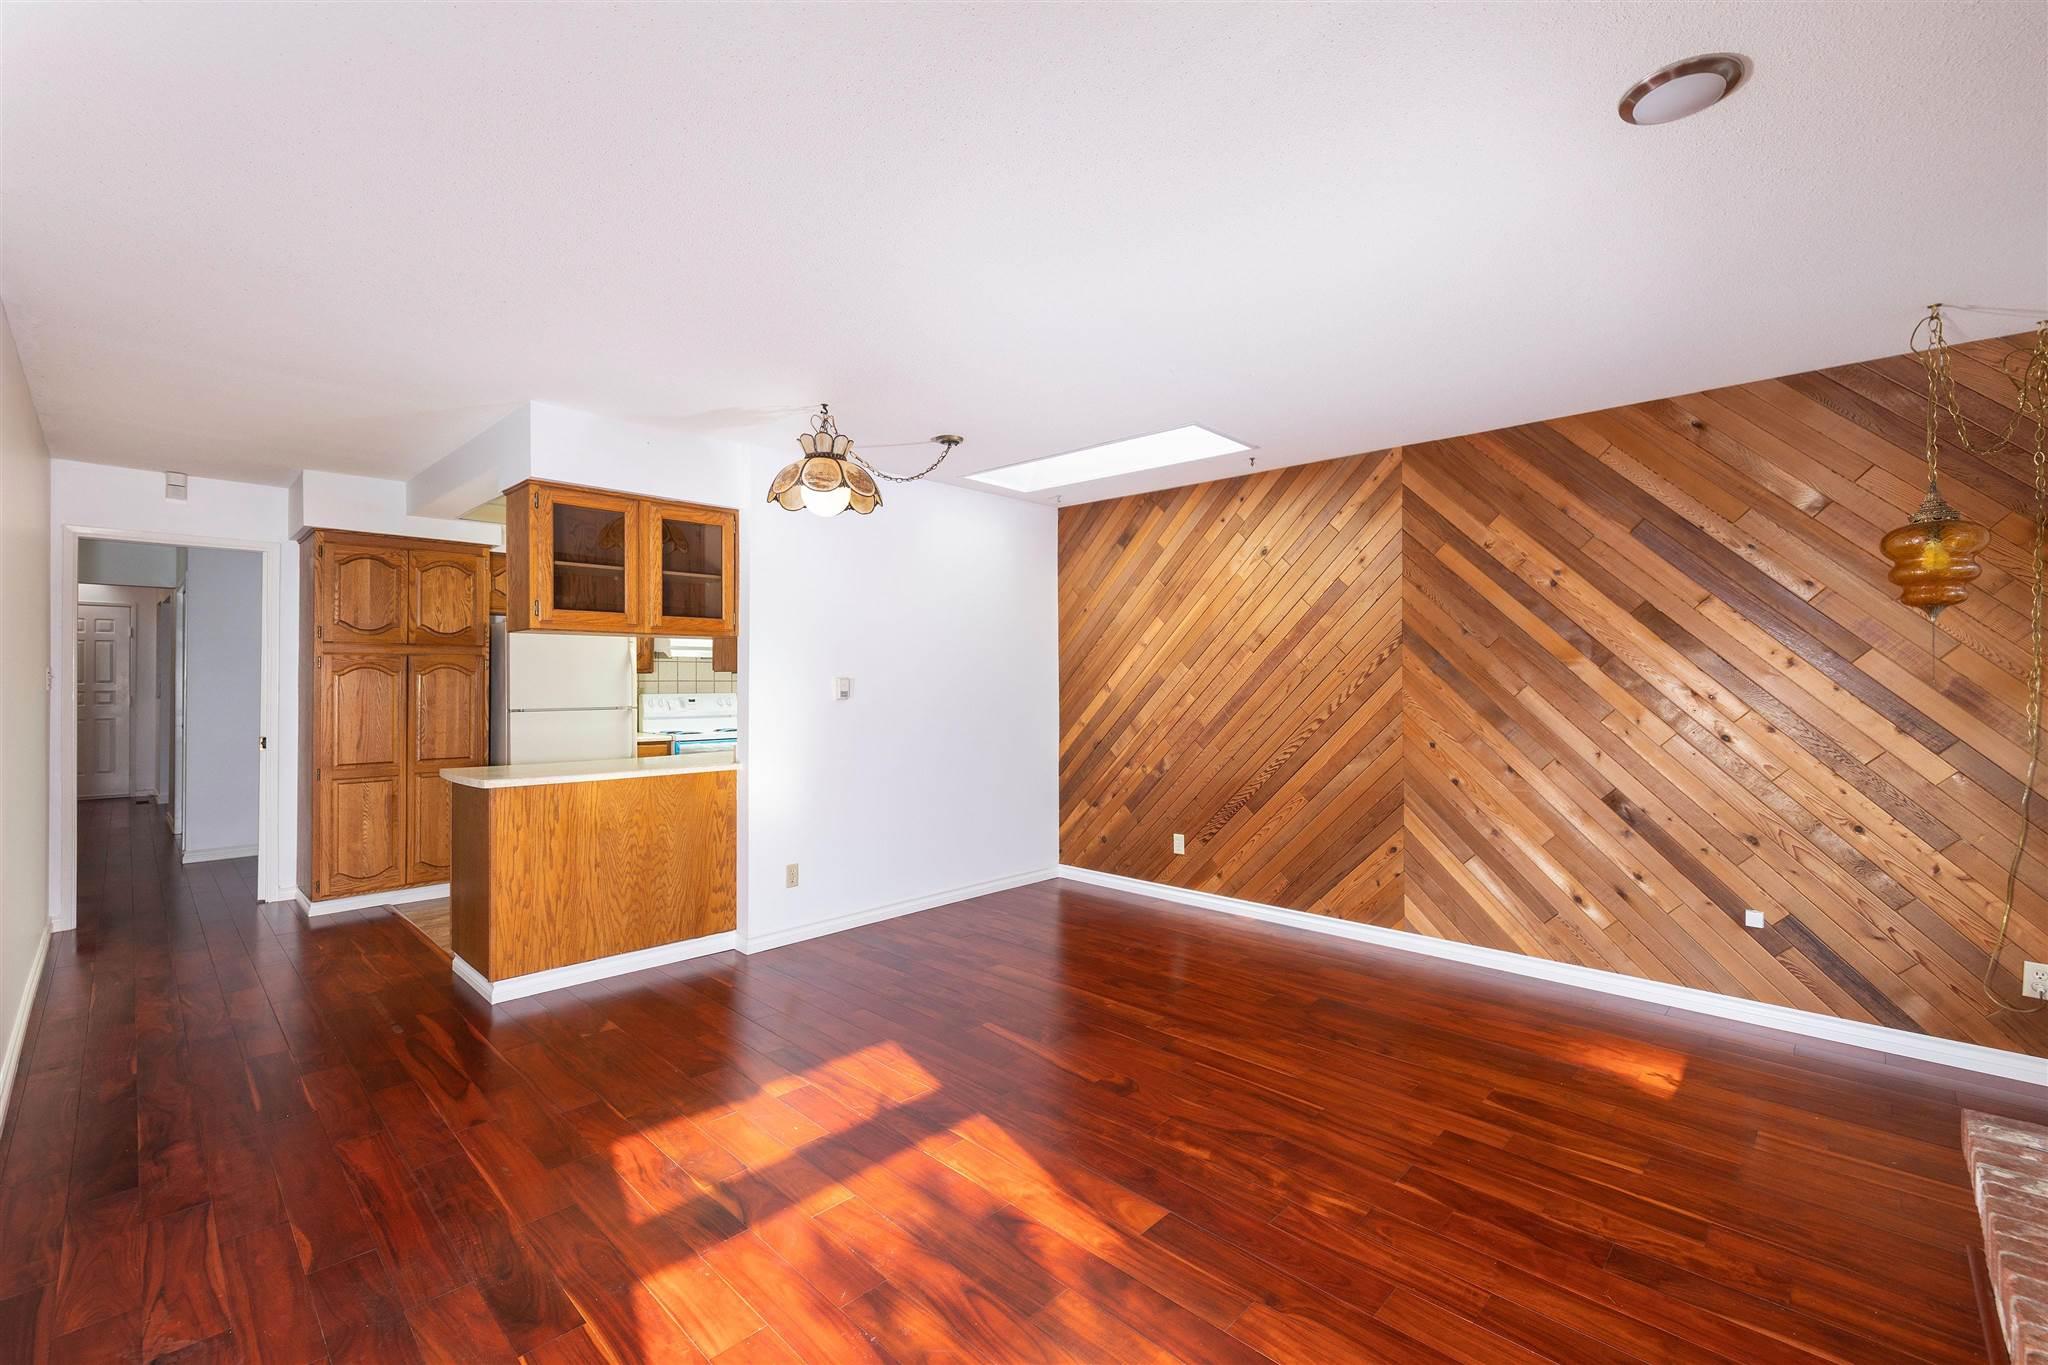 1743 148A STREET - Sunnyside Park Surrey House/Single Family for sale, 3 Bedrooms (R2604804) - #9